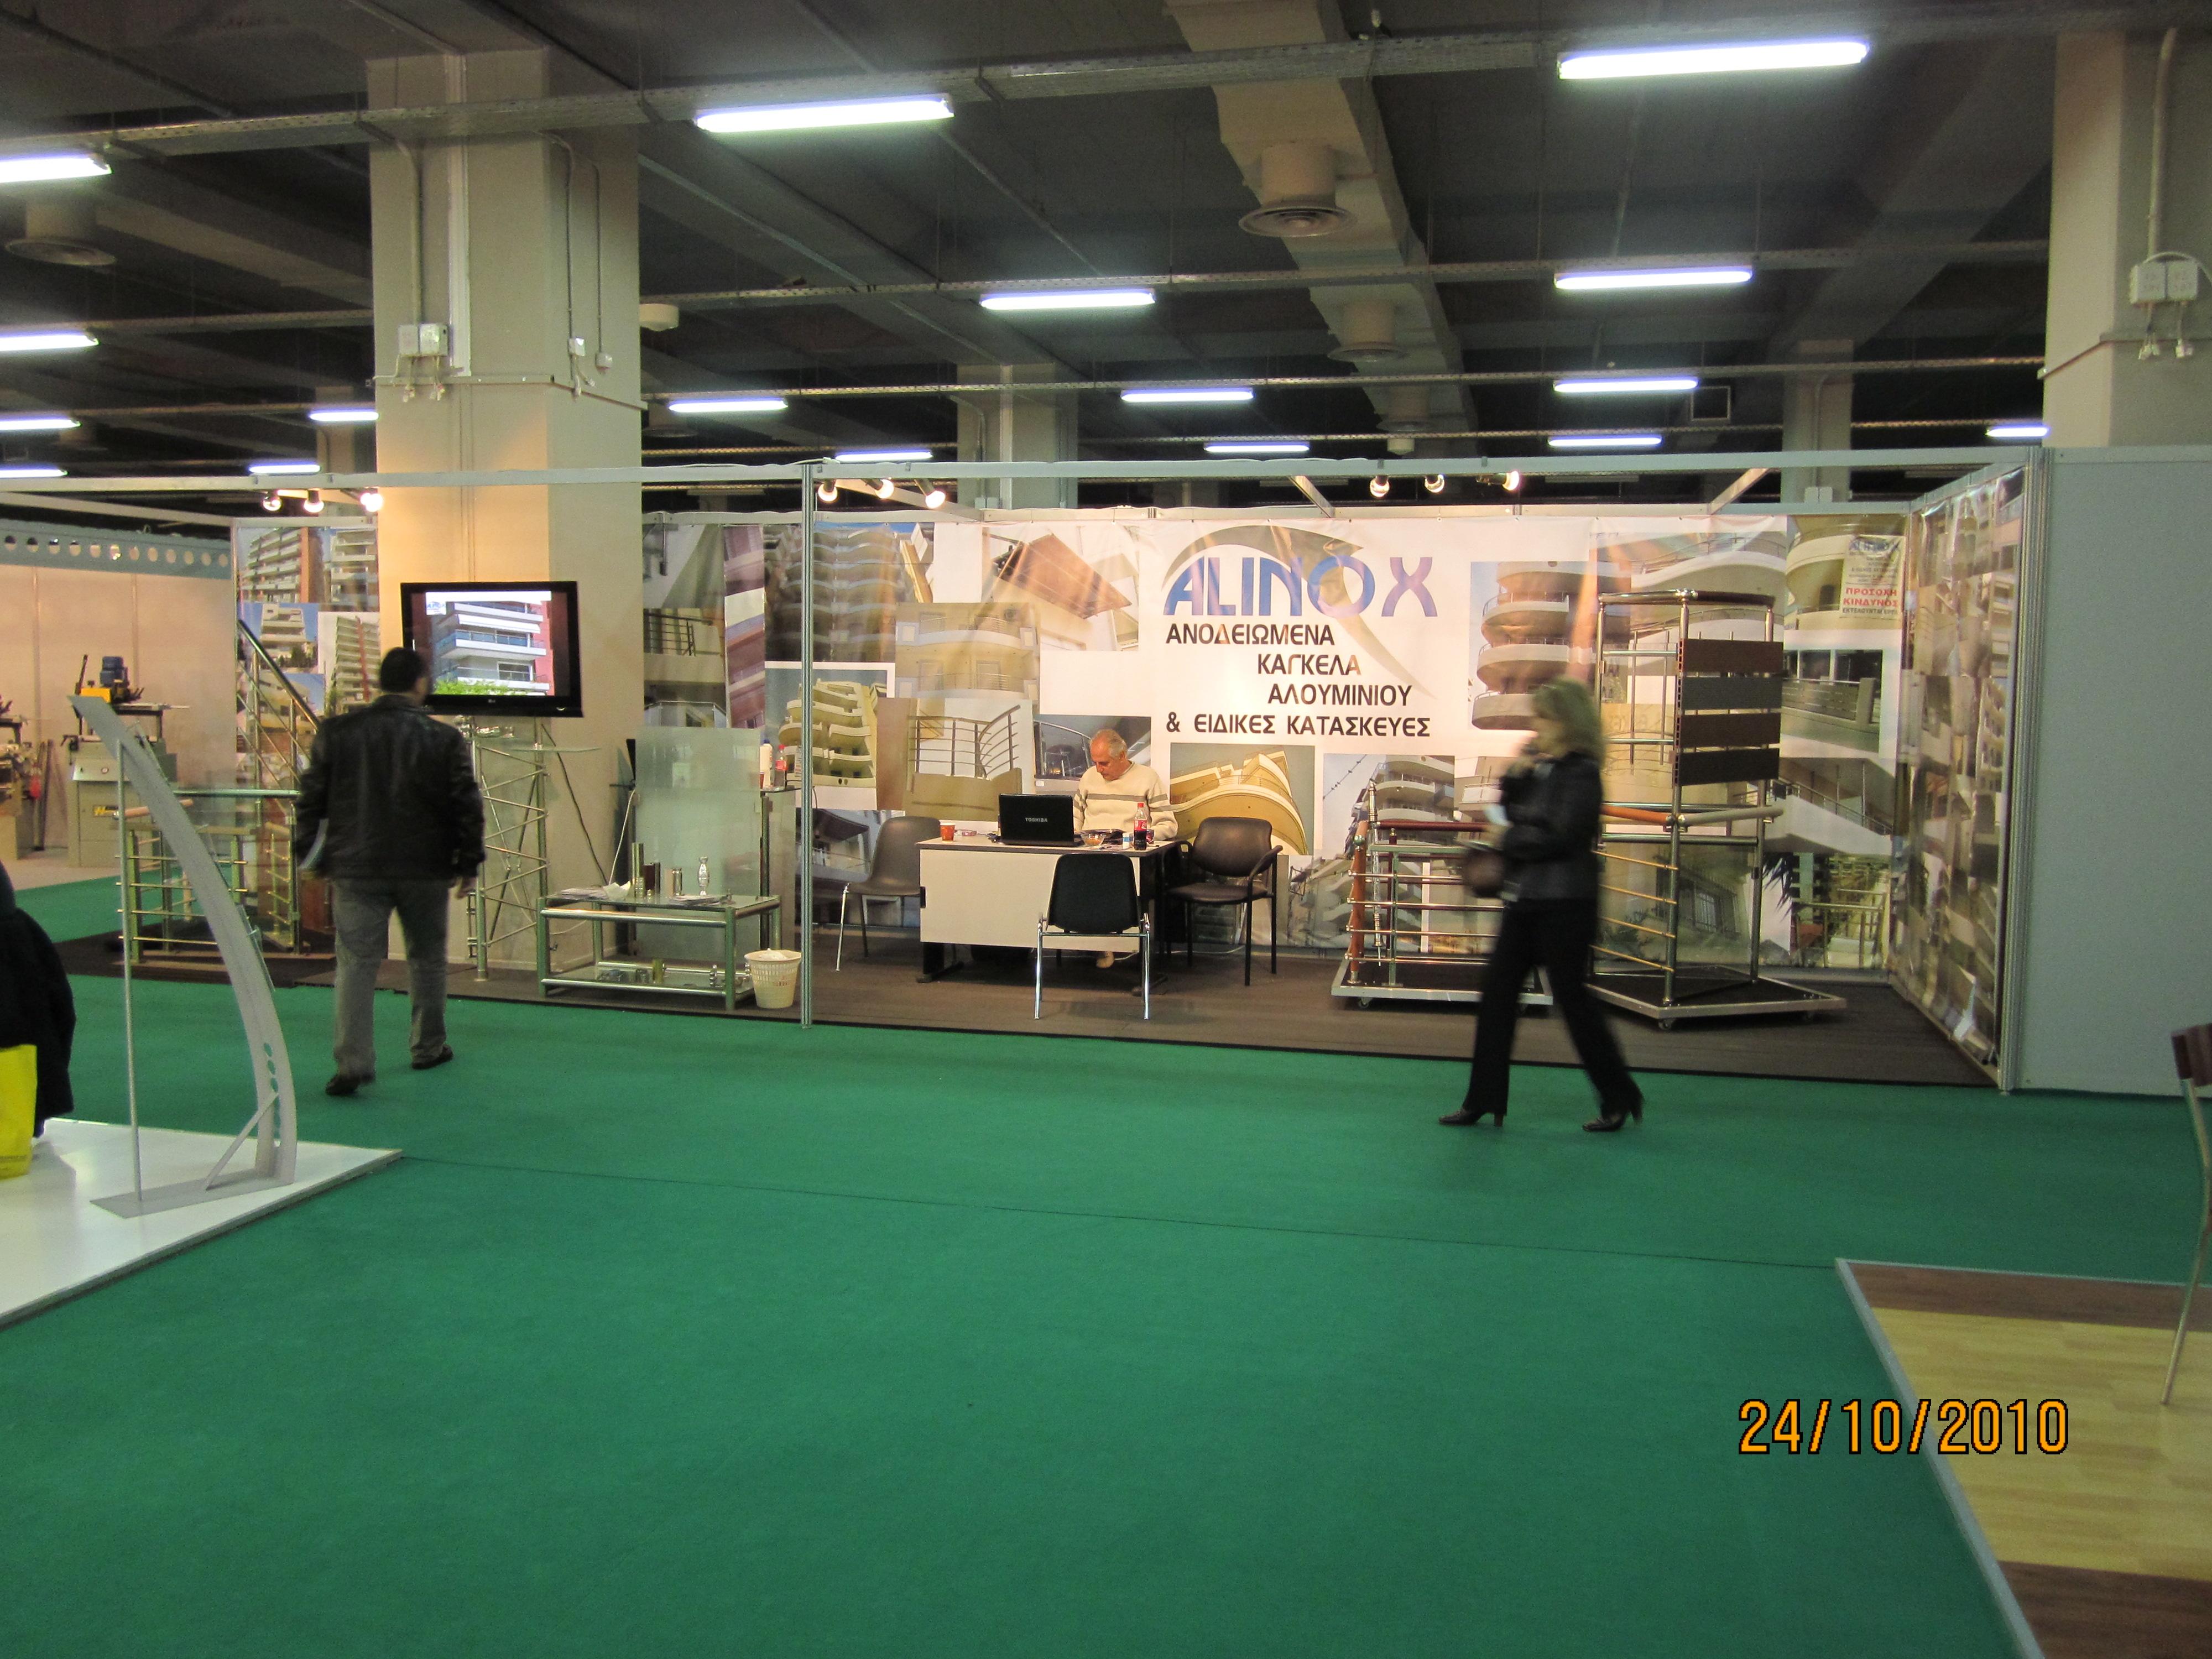 Expo_Athens_9.JPG